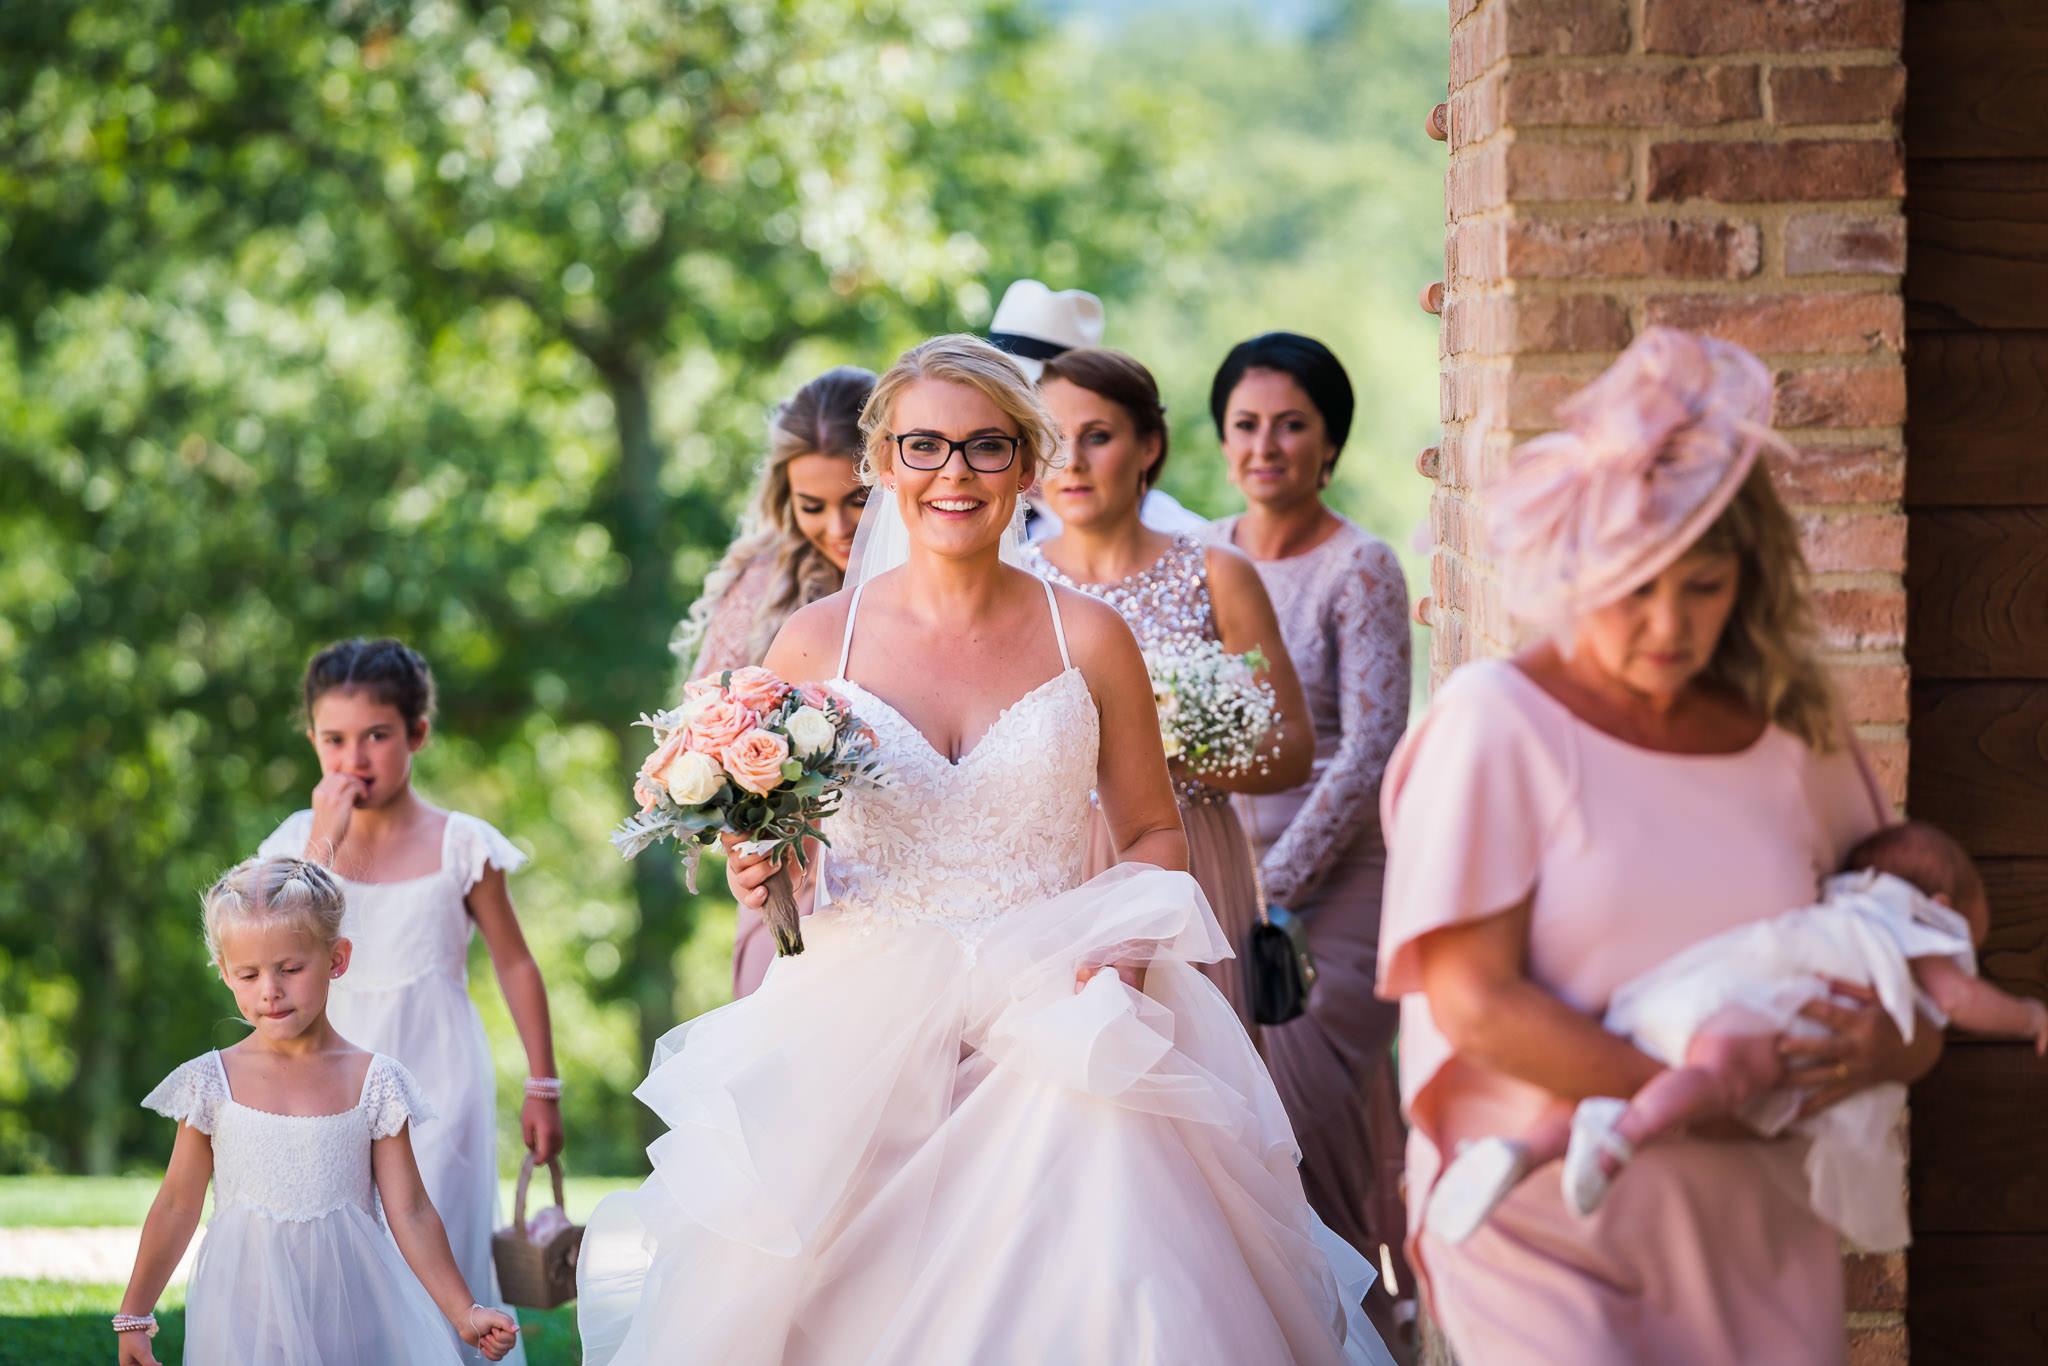 NC-2018-09-07_gemma-and-steve-wedding-1189.jpg